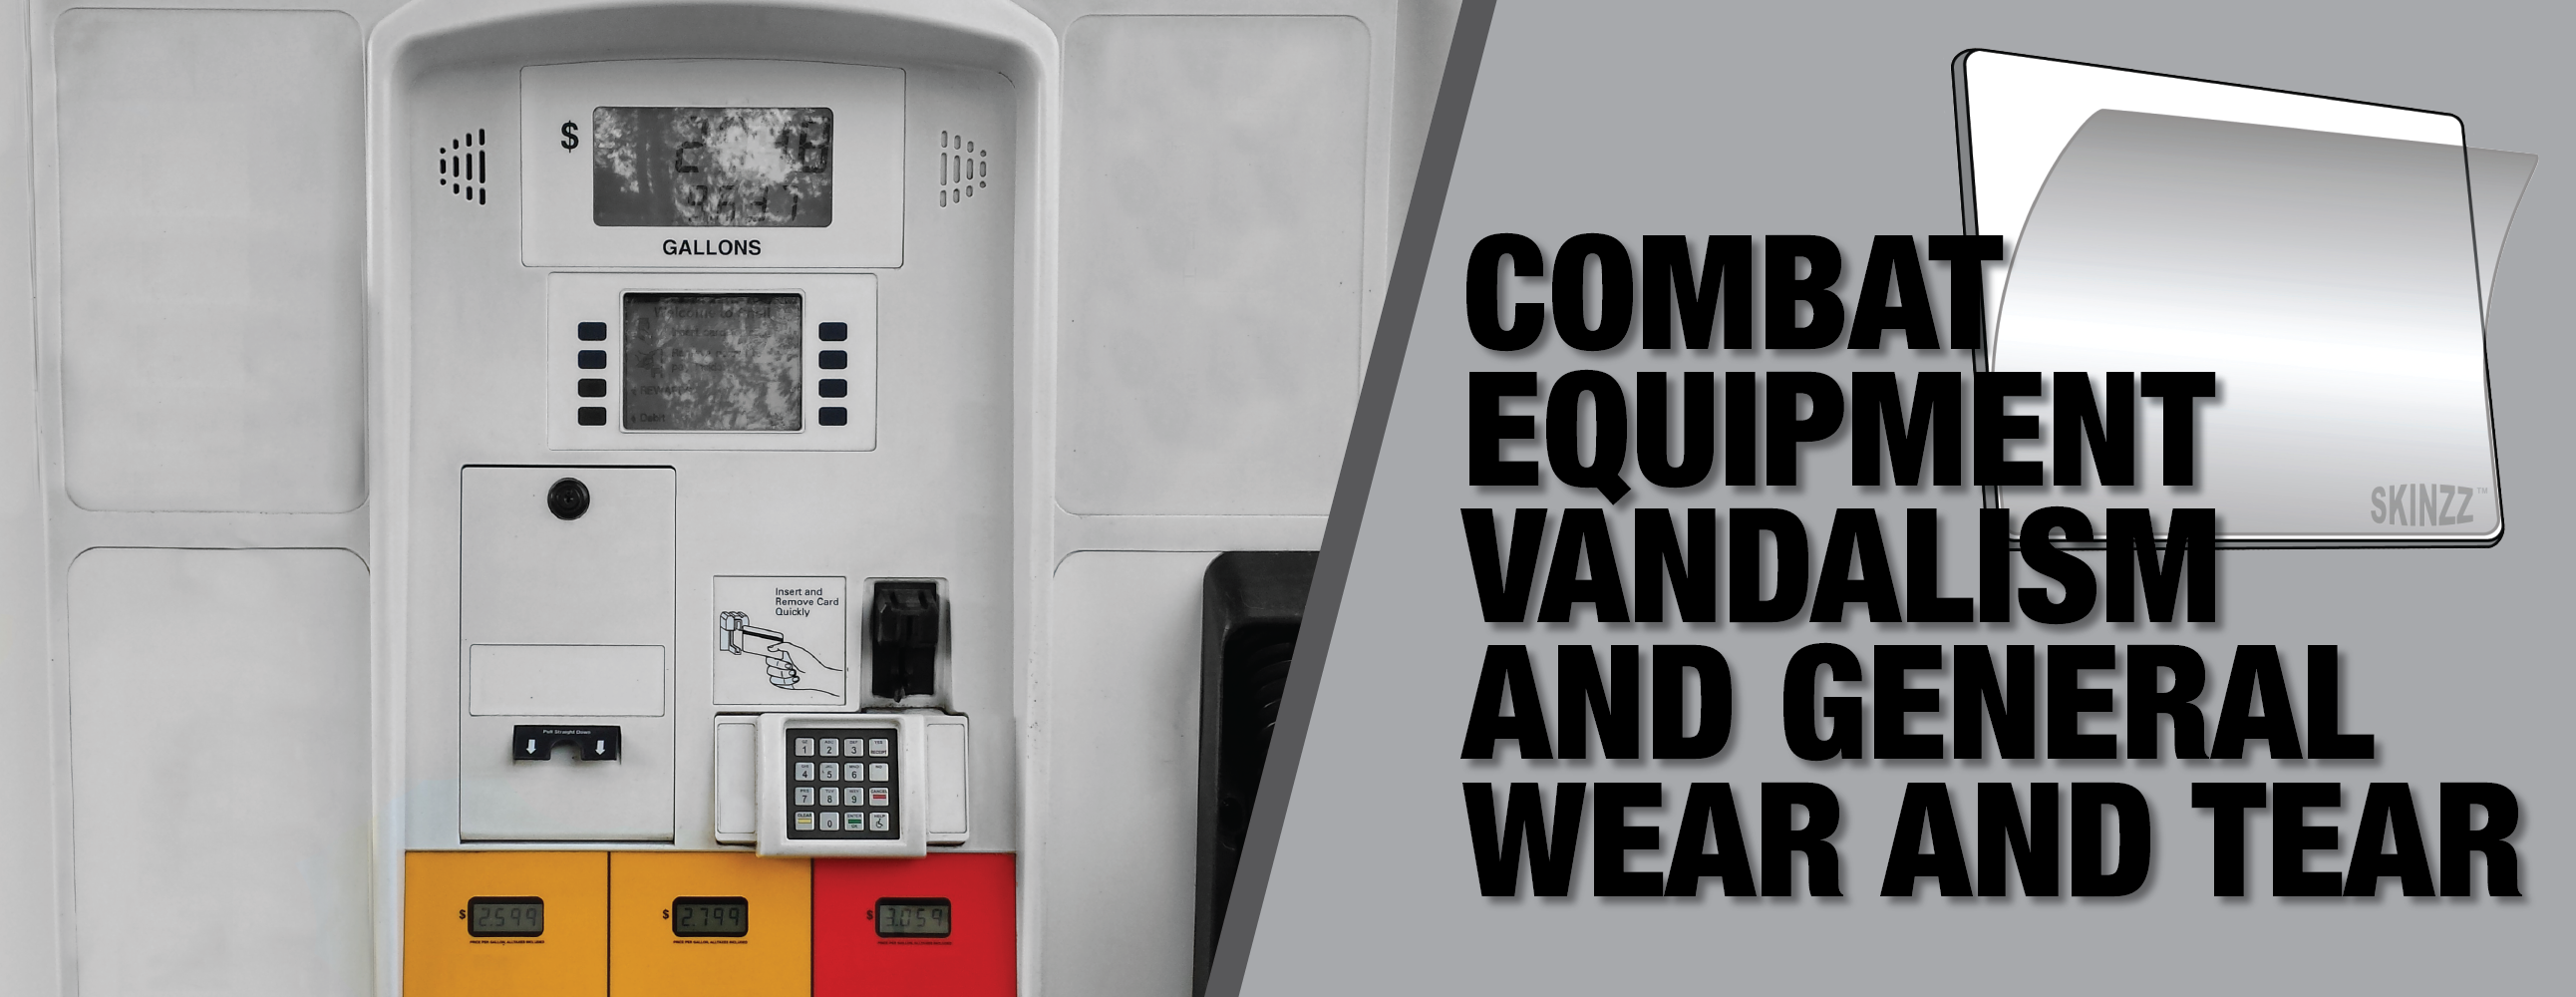 Need Dispenser Shields? Try award winning SKINZZ®